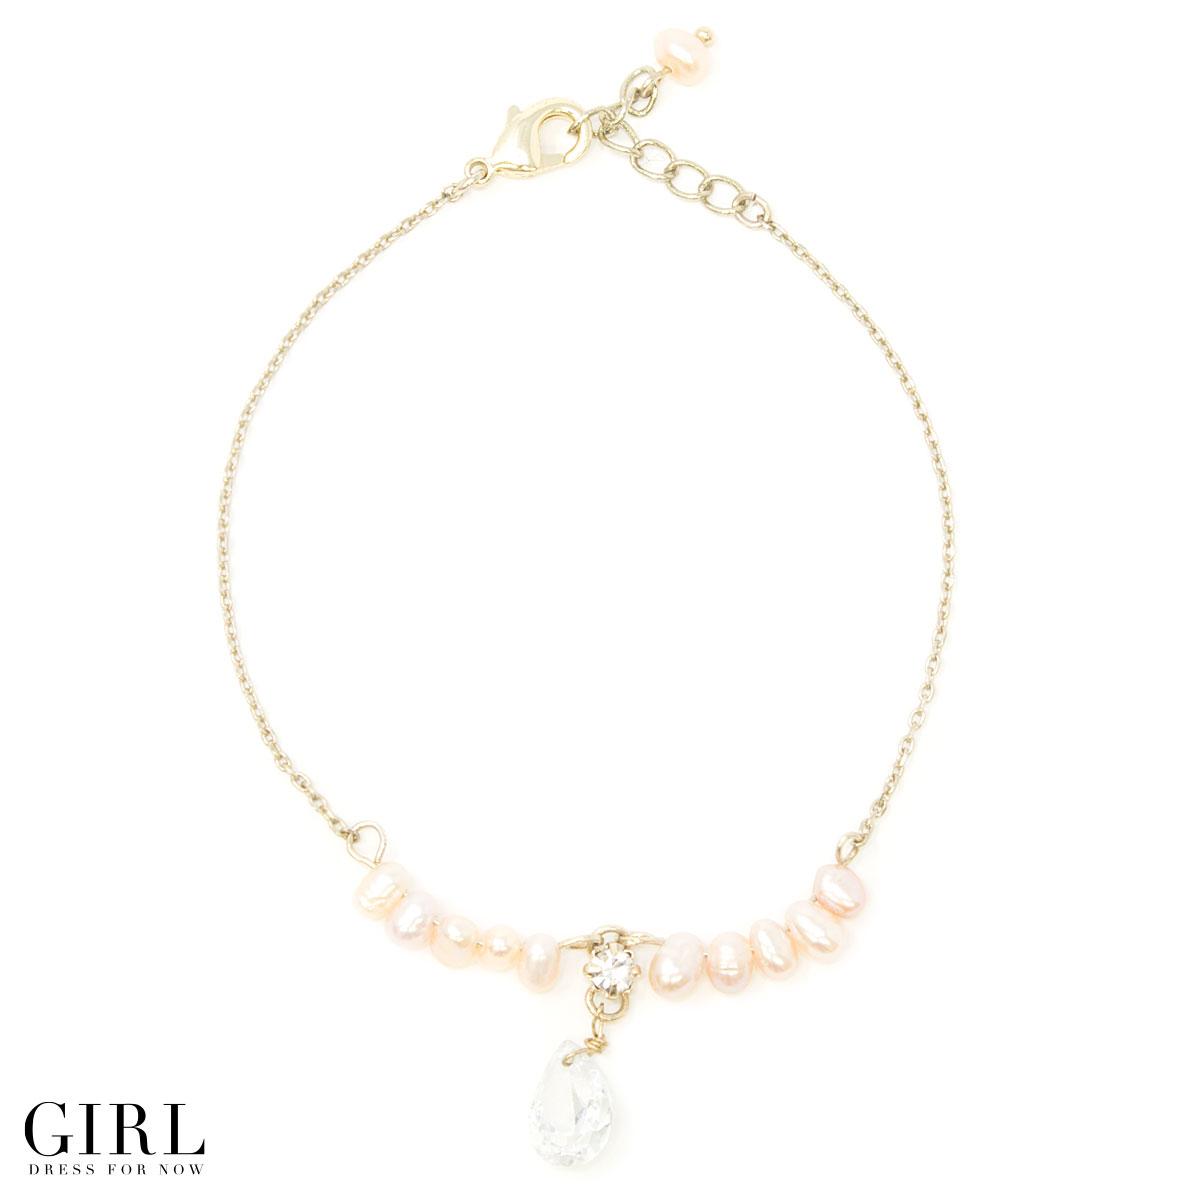 Bracelet dating